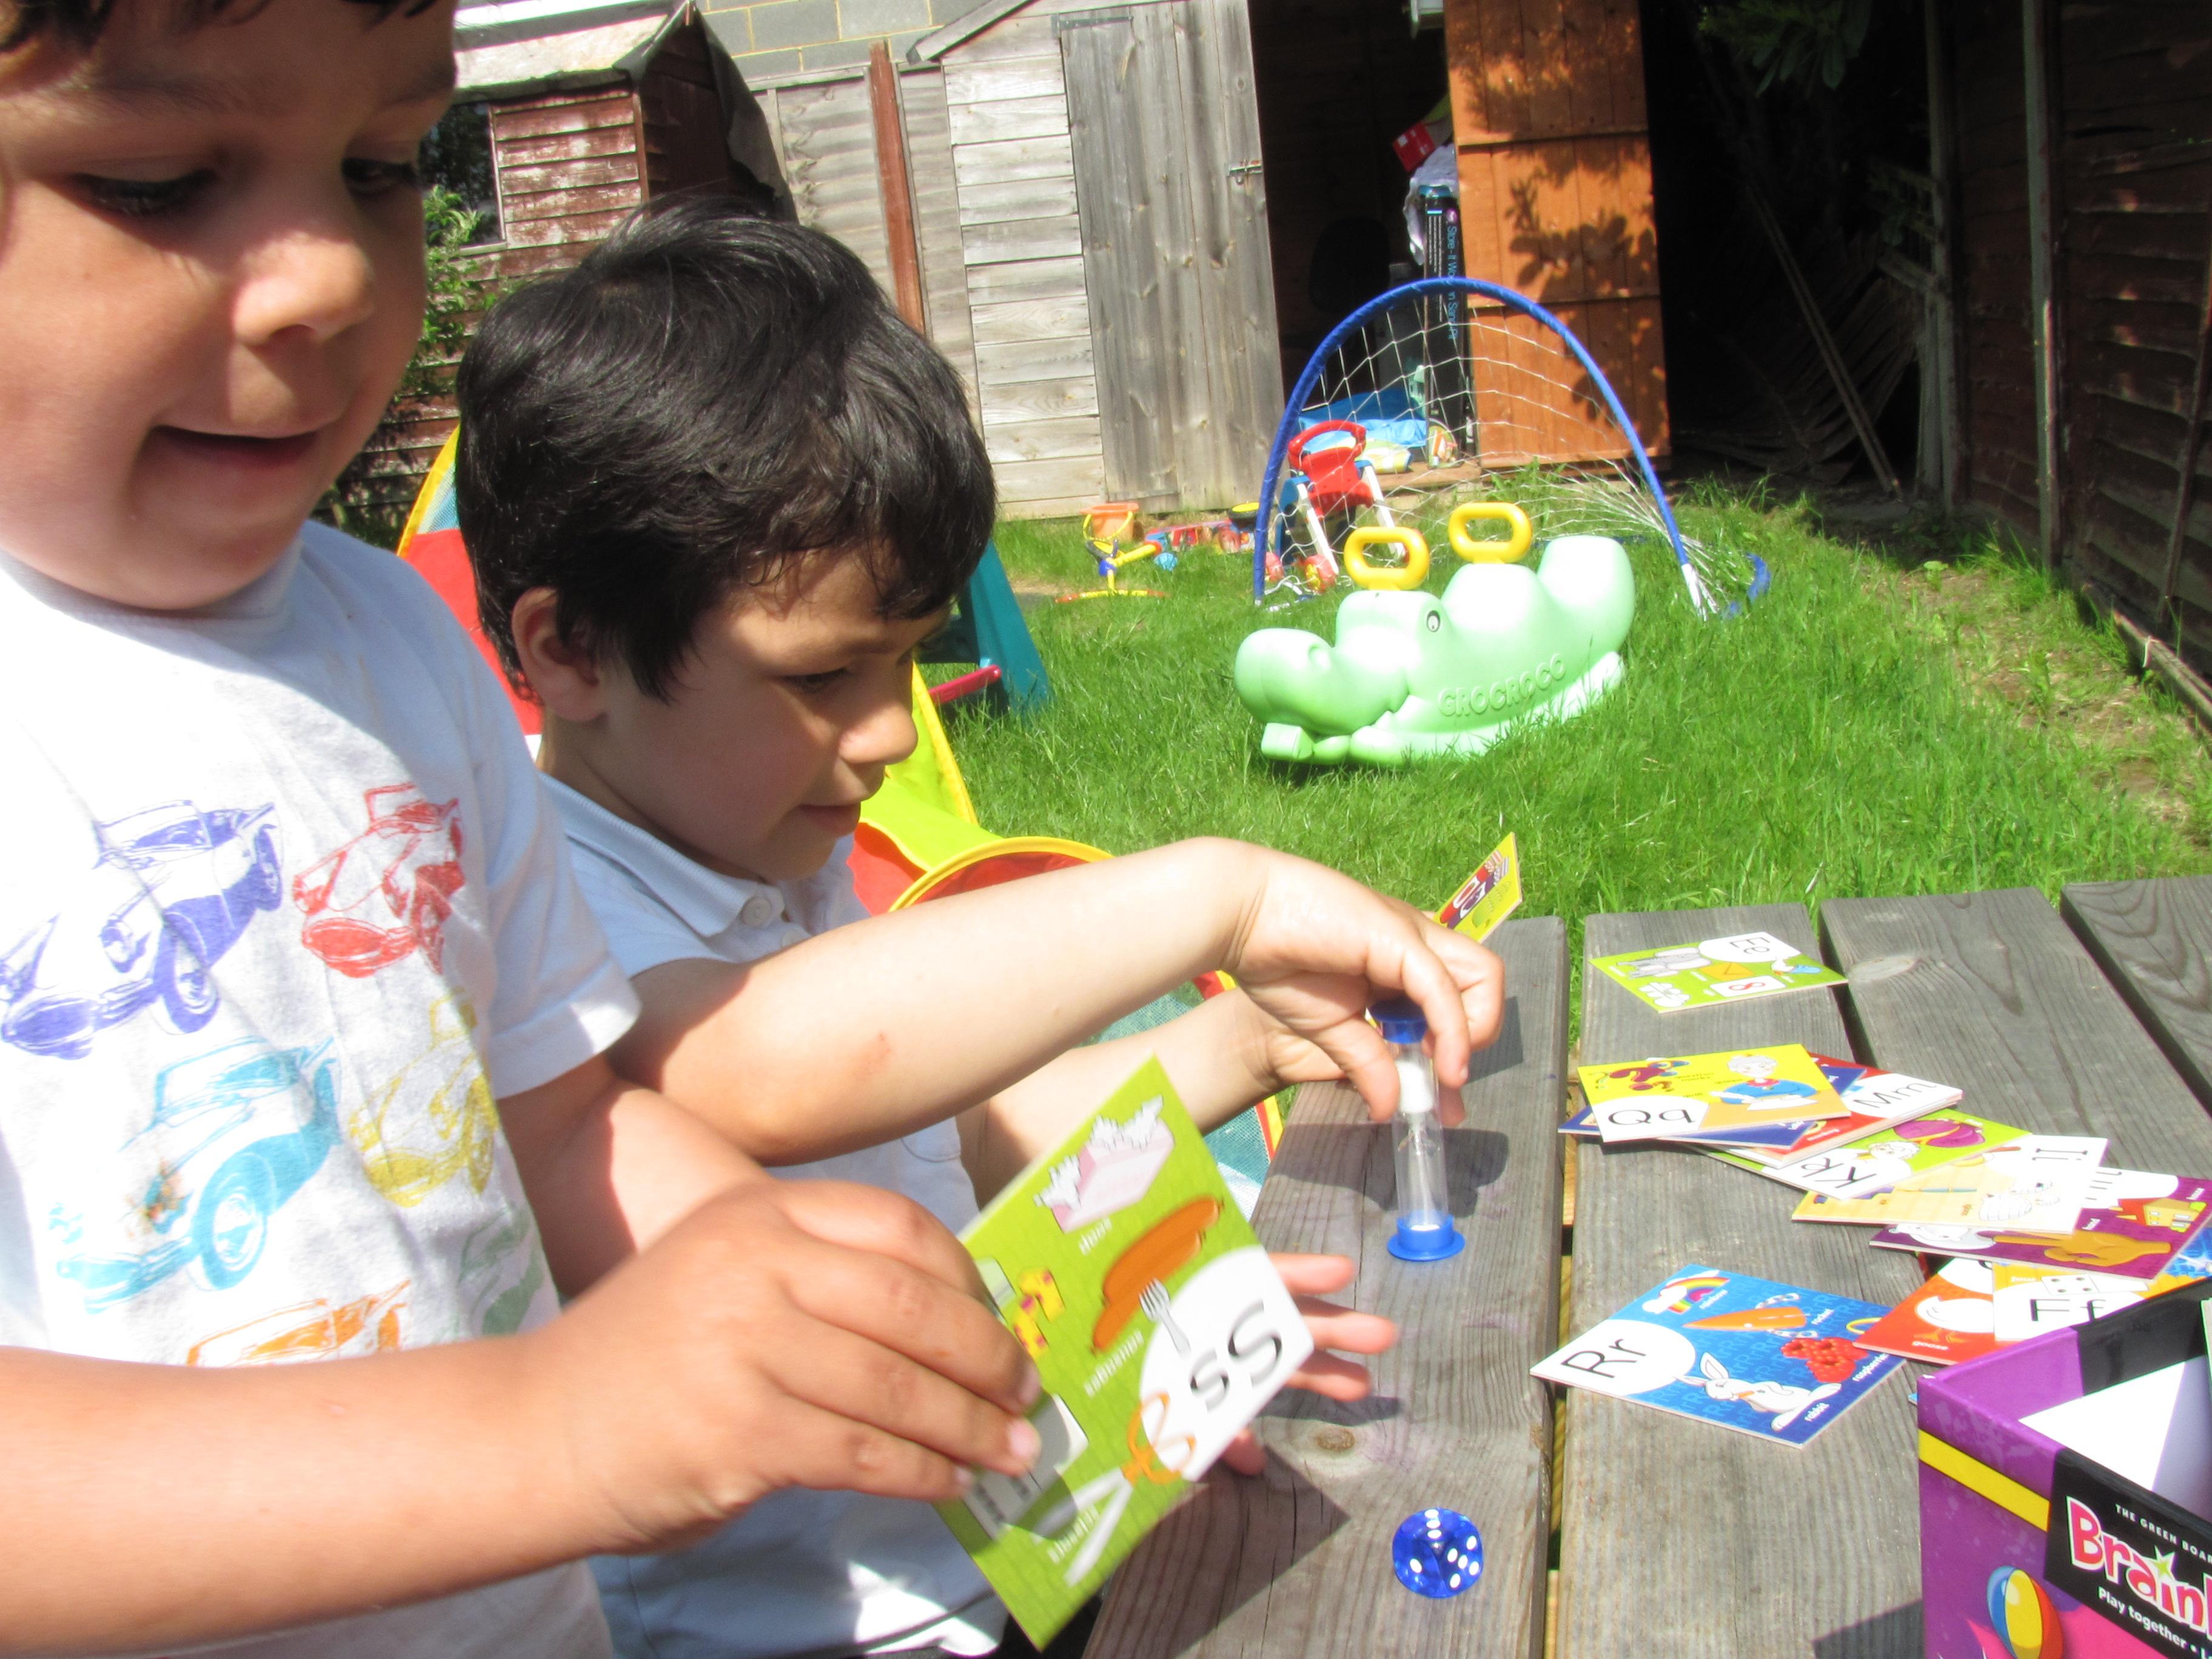 playing brainbox games in the garden